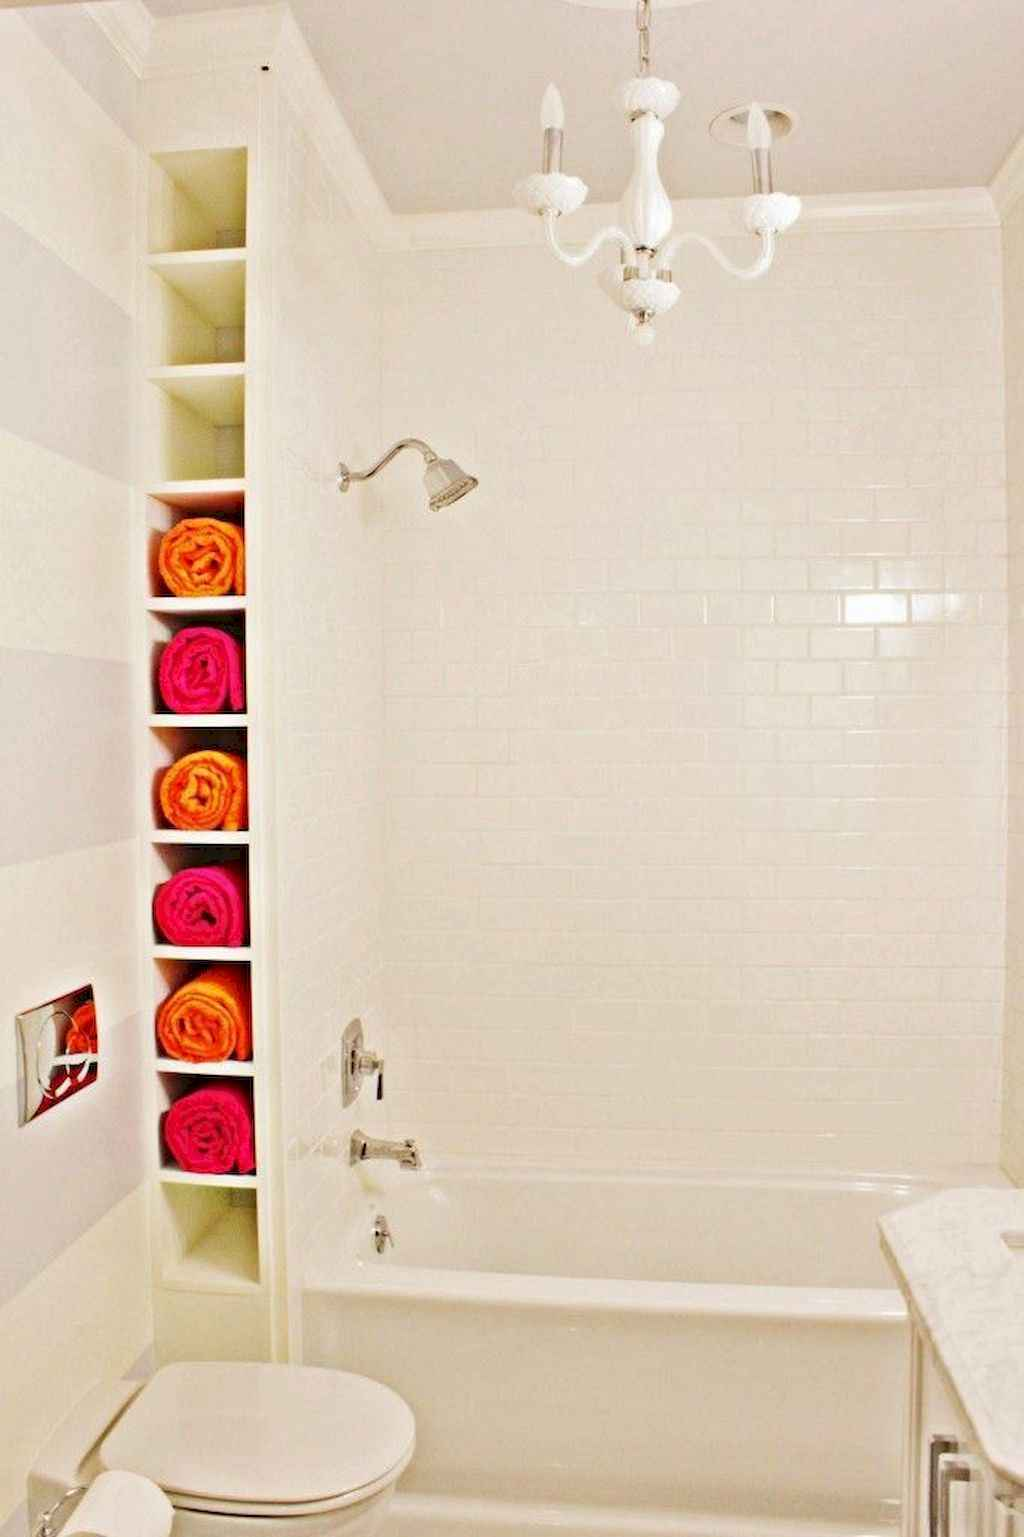 111 Brilliant Small Bathroom Remodel Ideas On A Budget (61)